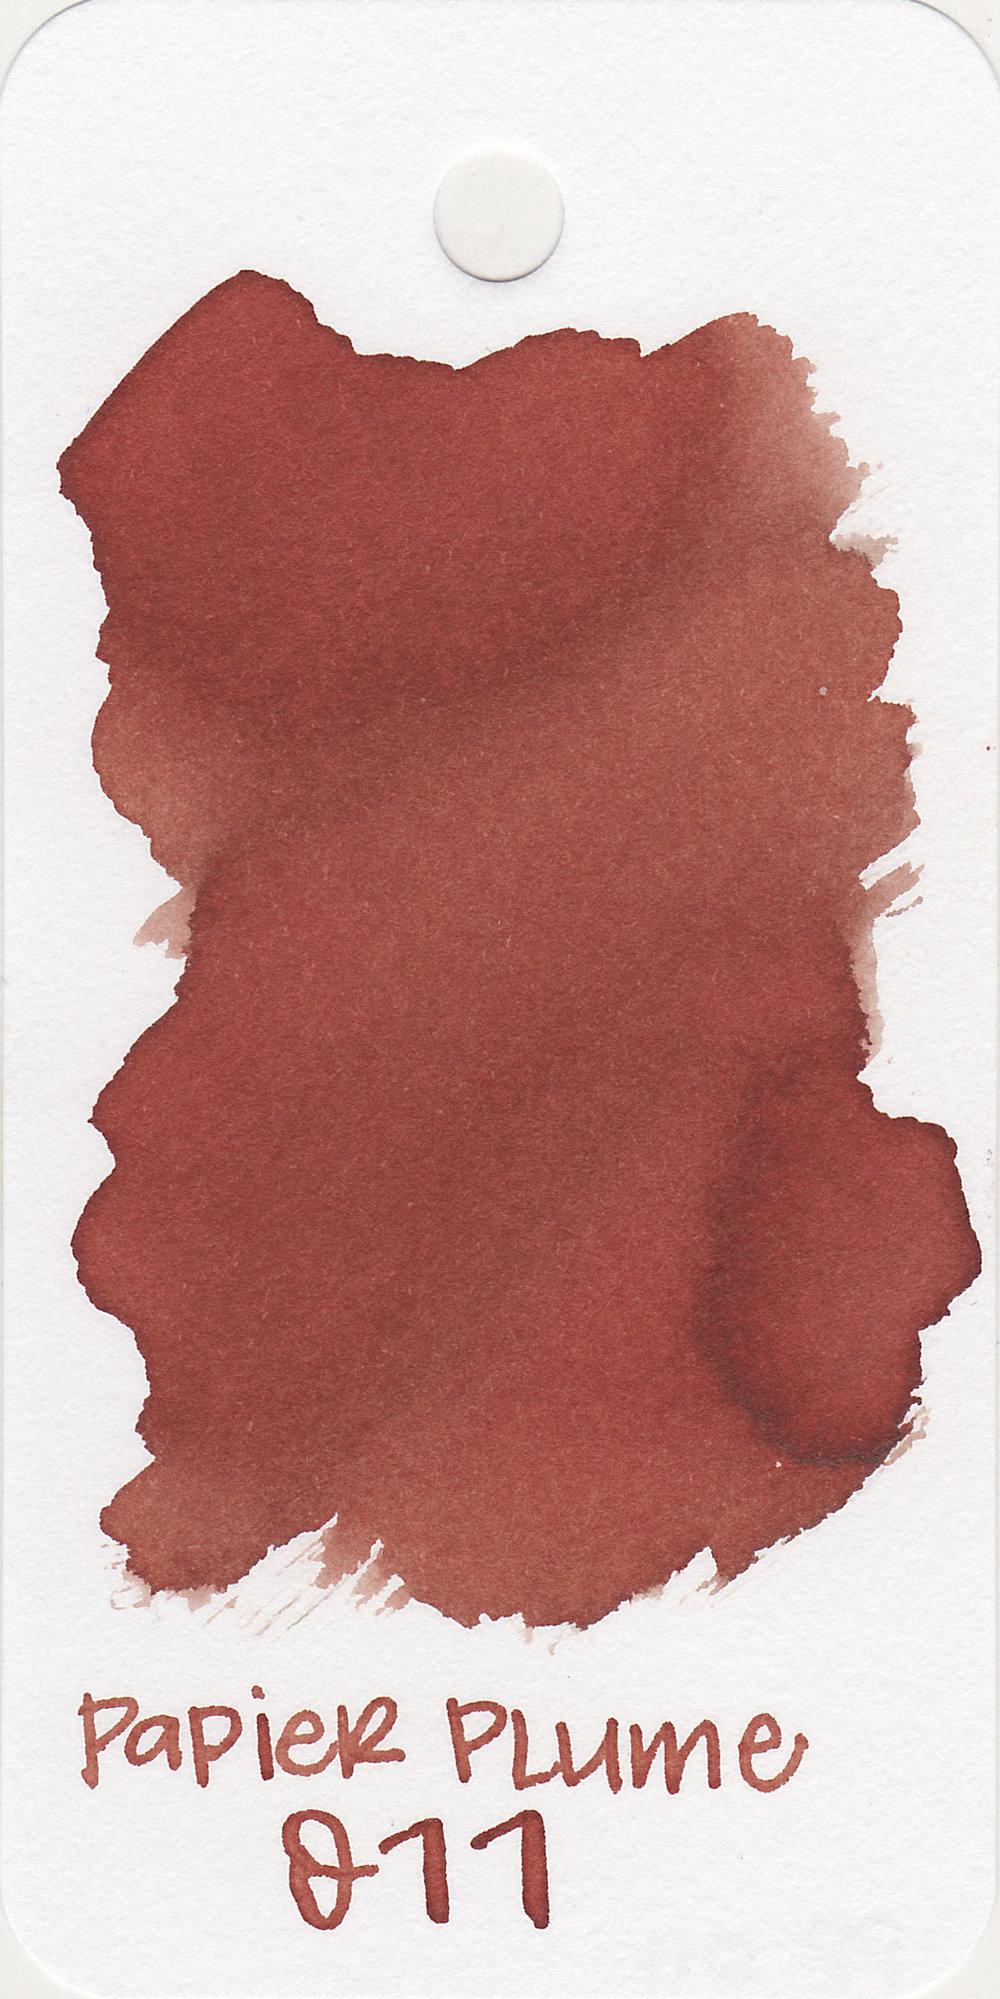 The color: - Eleven is a dark burnt orange.